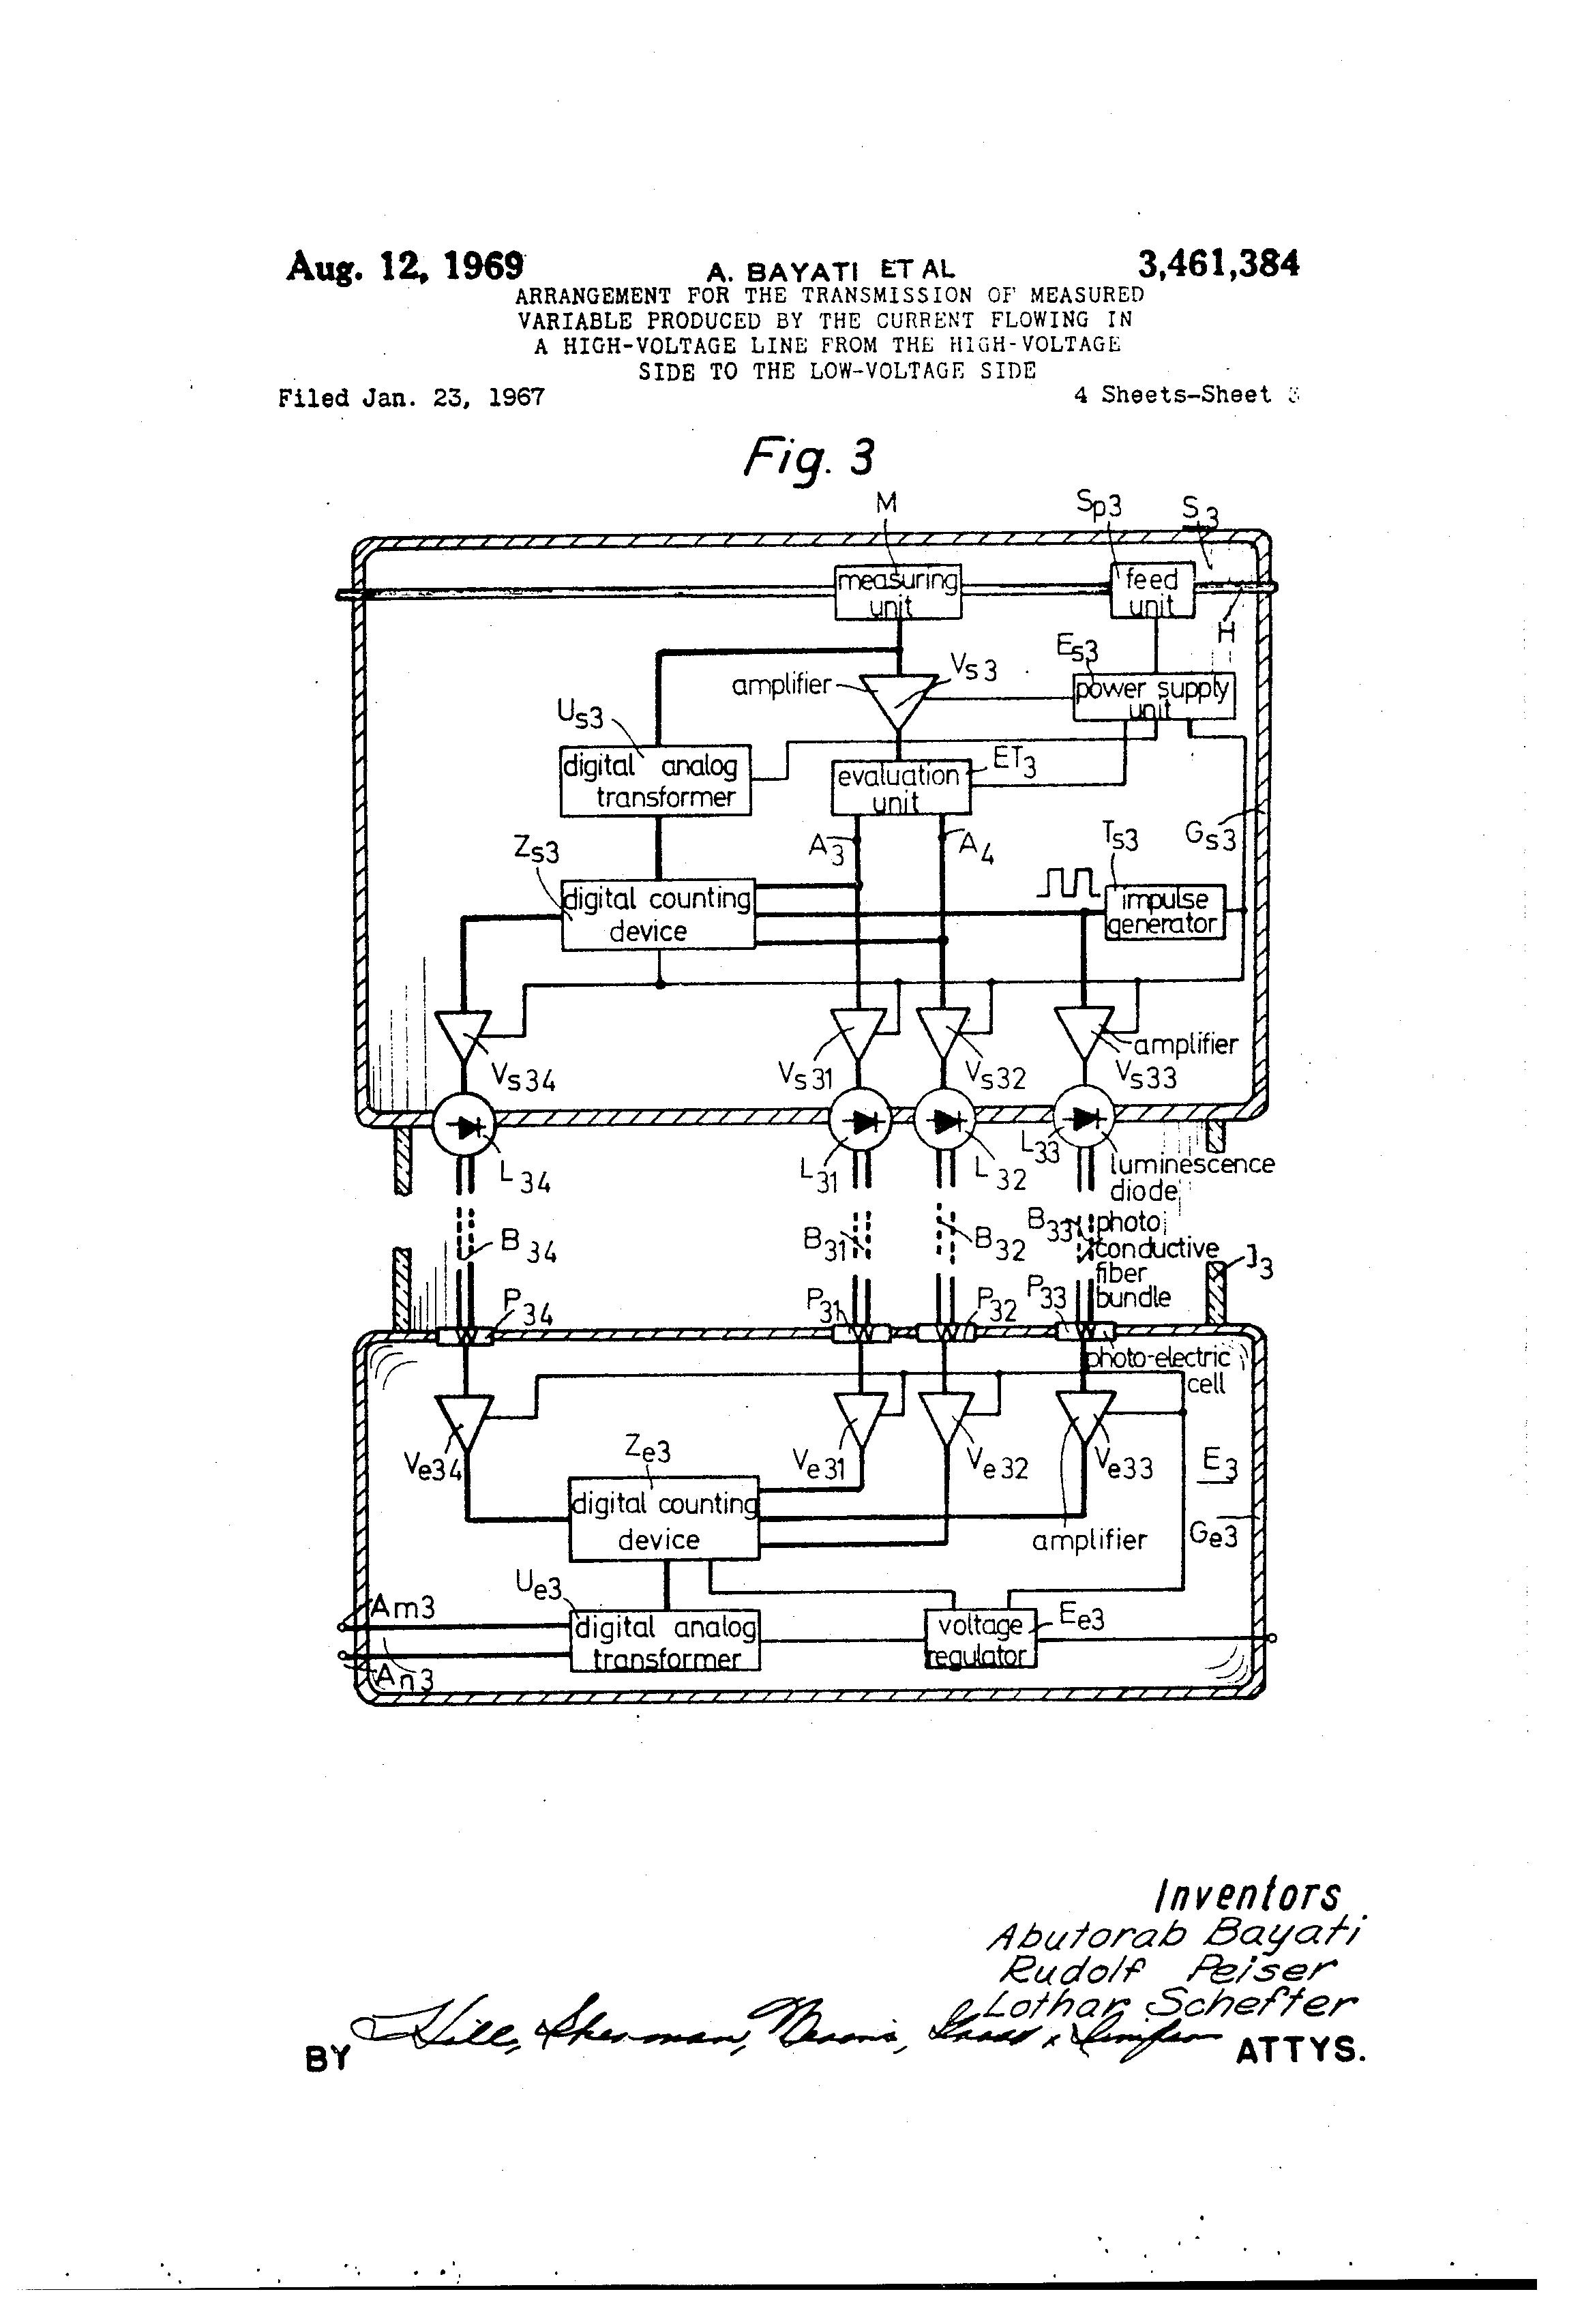 Ammeter Shunt Wiring Diagram Likewise Digital Ammeter Wiring Diagram